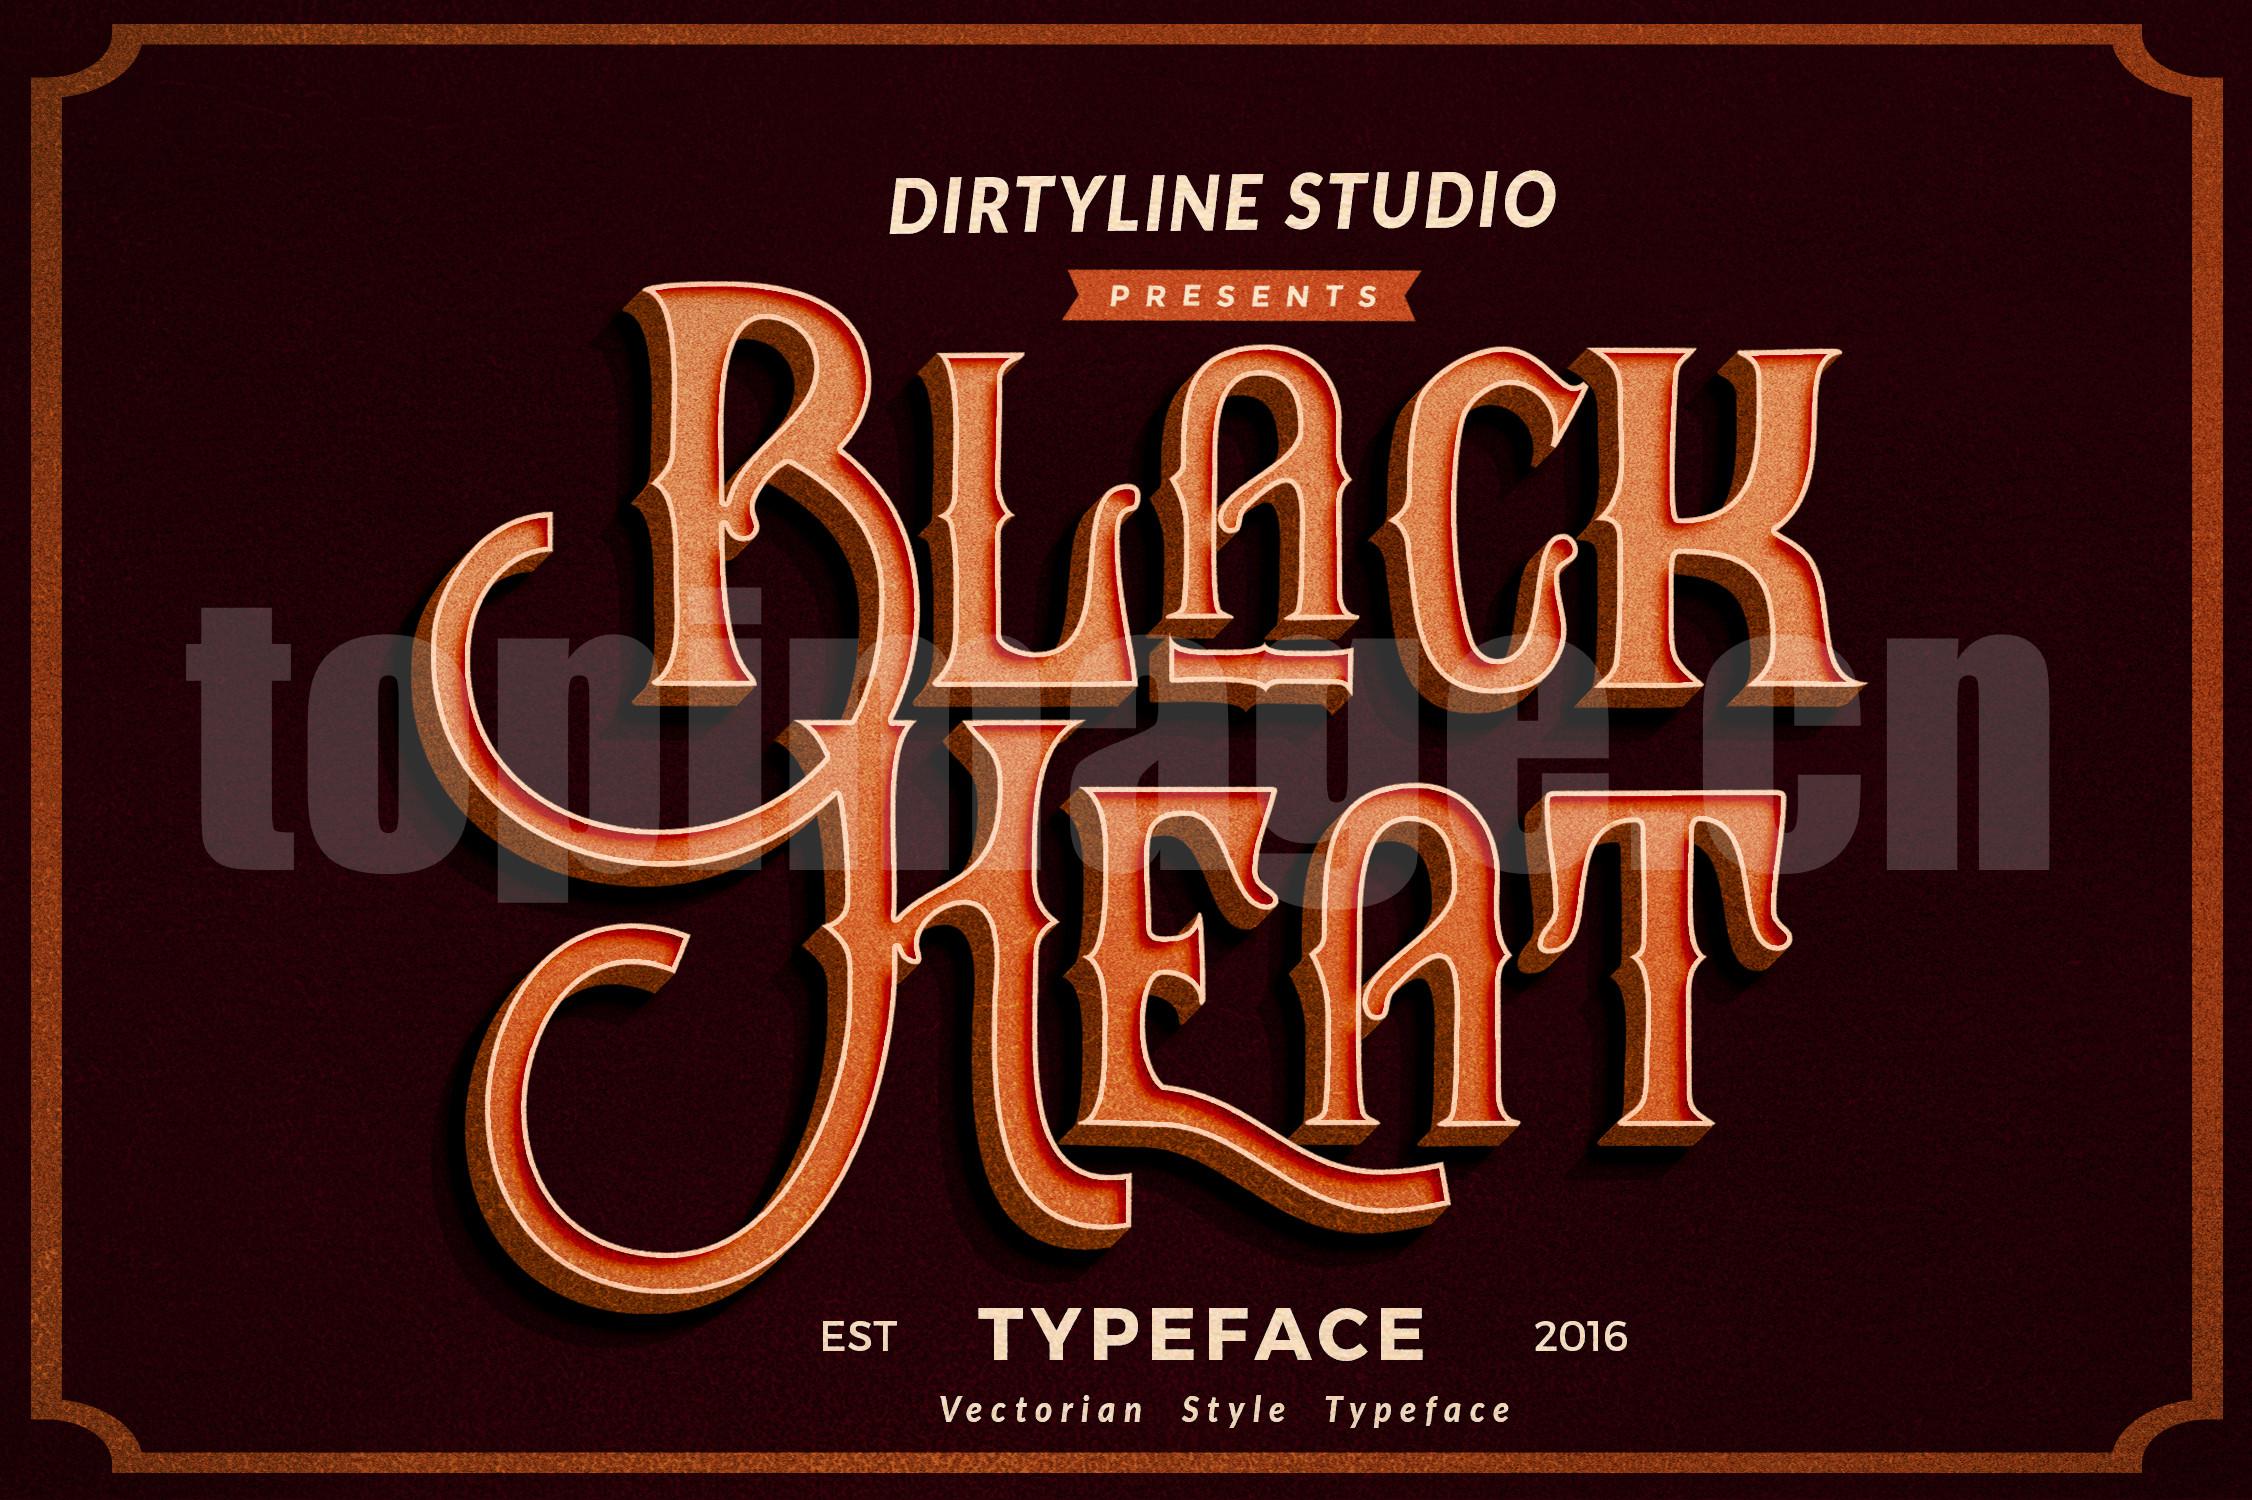 Black-Heat复古个性化飘逸立体感哥特式艺术英文字体下载